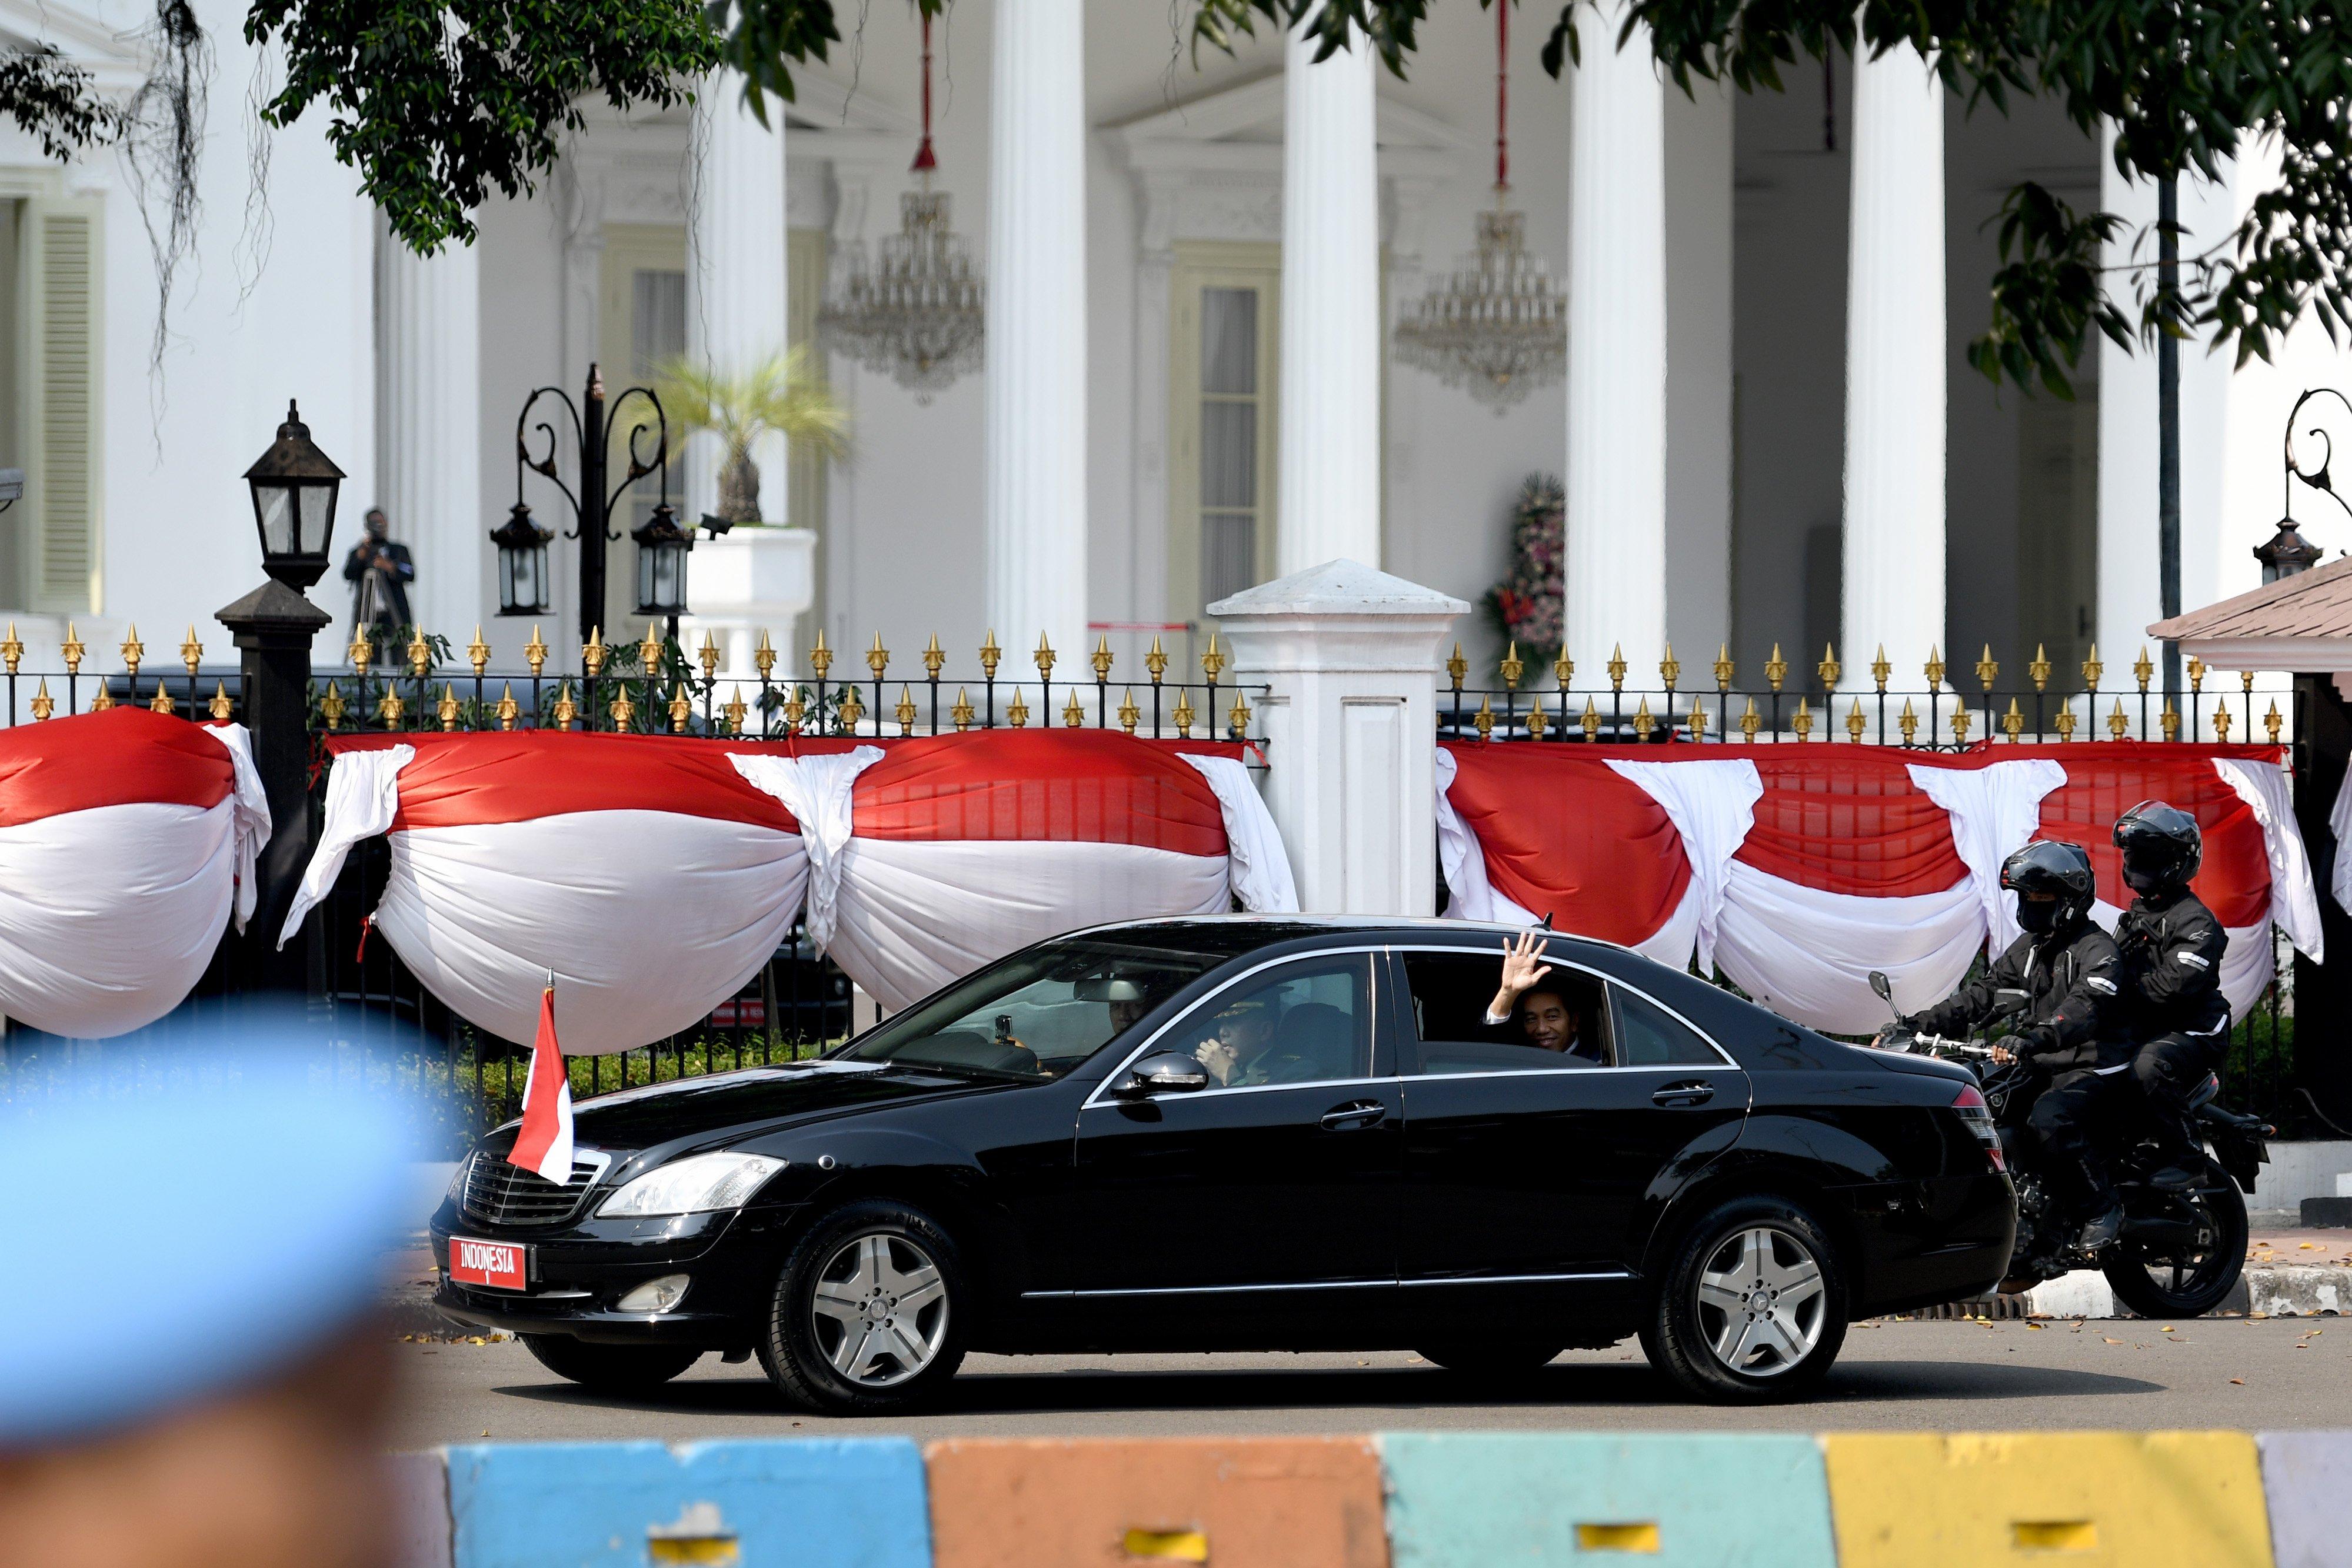 Presiden Joko Widodo melambaikan tangan kepada warga dari dalam mobil saat menuju lokasi upacara pelantikan Presiden dan Wakil Presiden periode 2019-2024 di Jakarta, Minggu (20/10/2019).